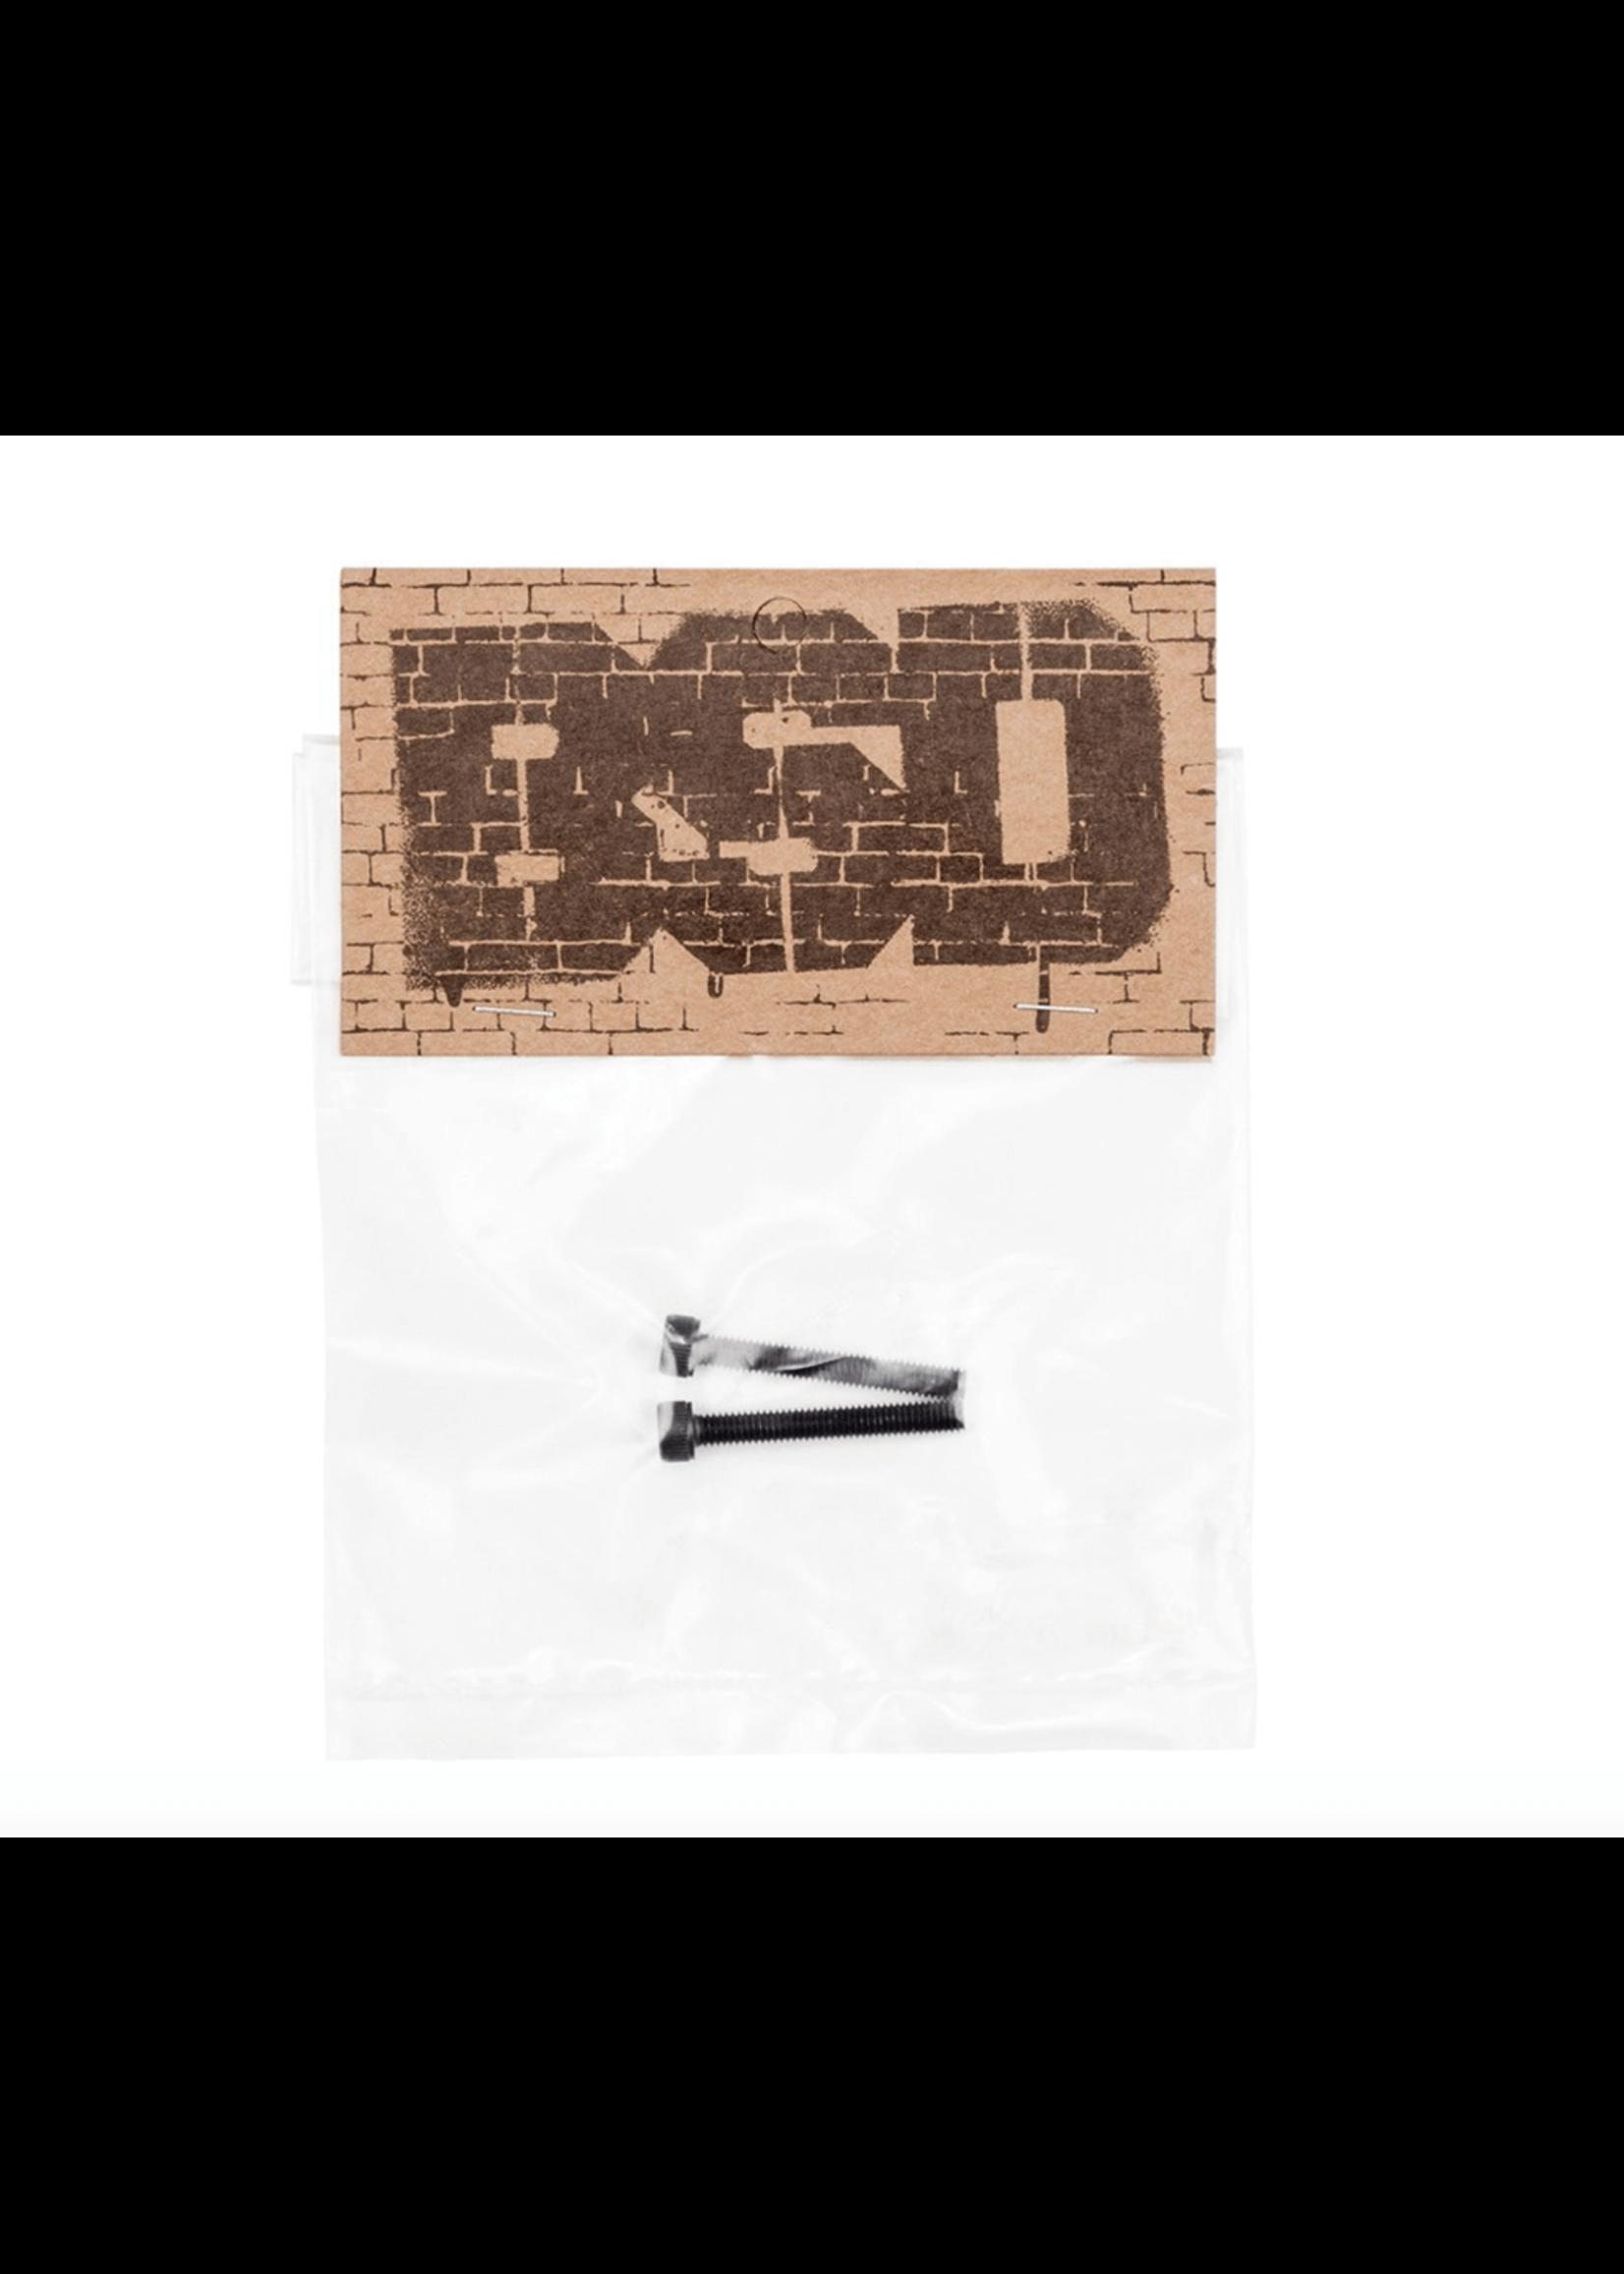 BSD BSD - Chain Tensioner Bolts